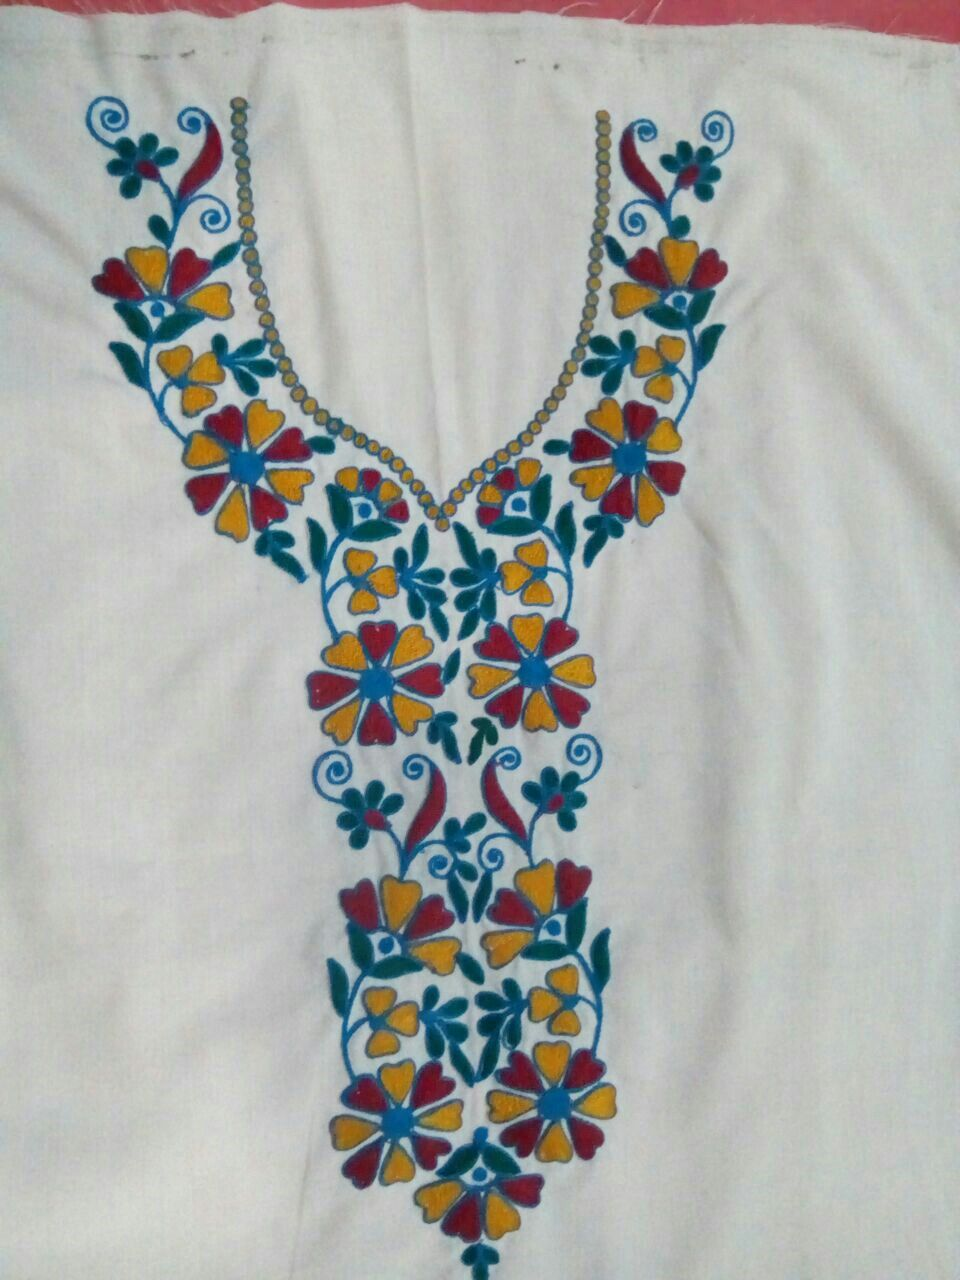 Pin by monica on Hand embroidery | Bordado, Blusones